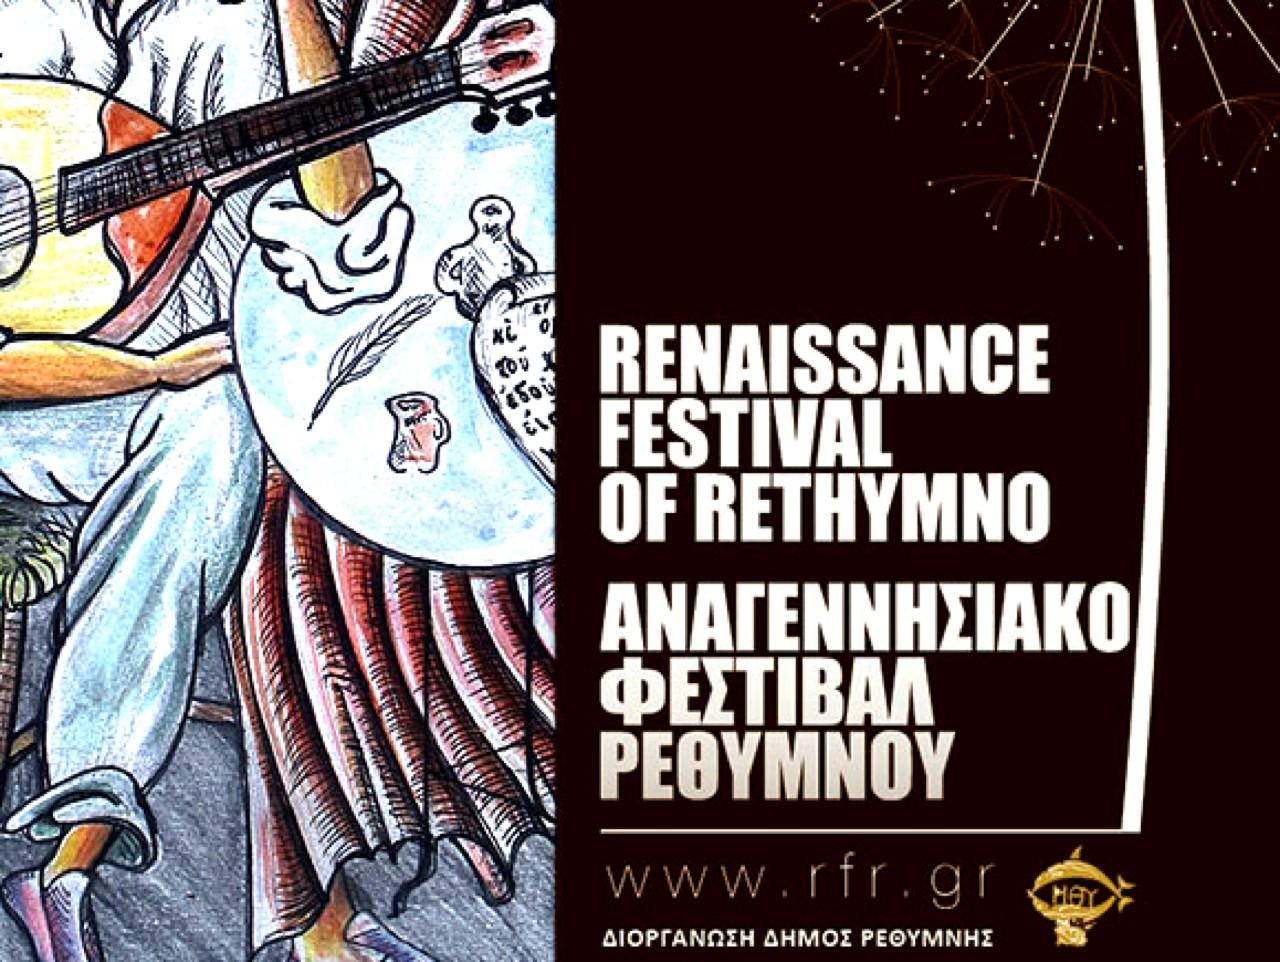 The Renaissance Festival in Rethimno, culture art music concerts rethymno, activities rethymno, events rethymno crete